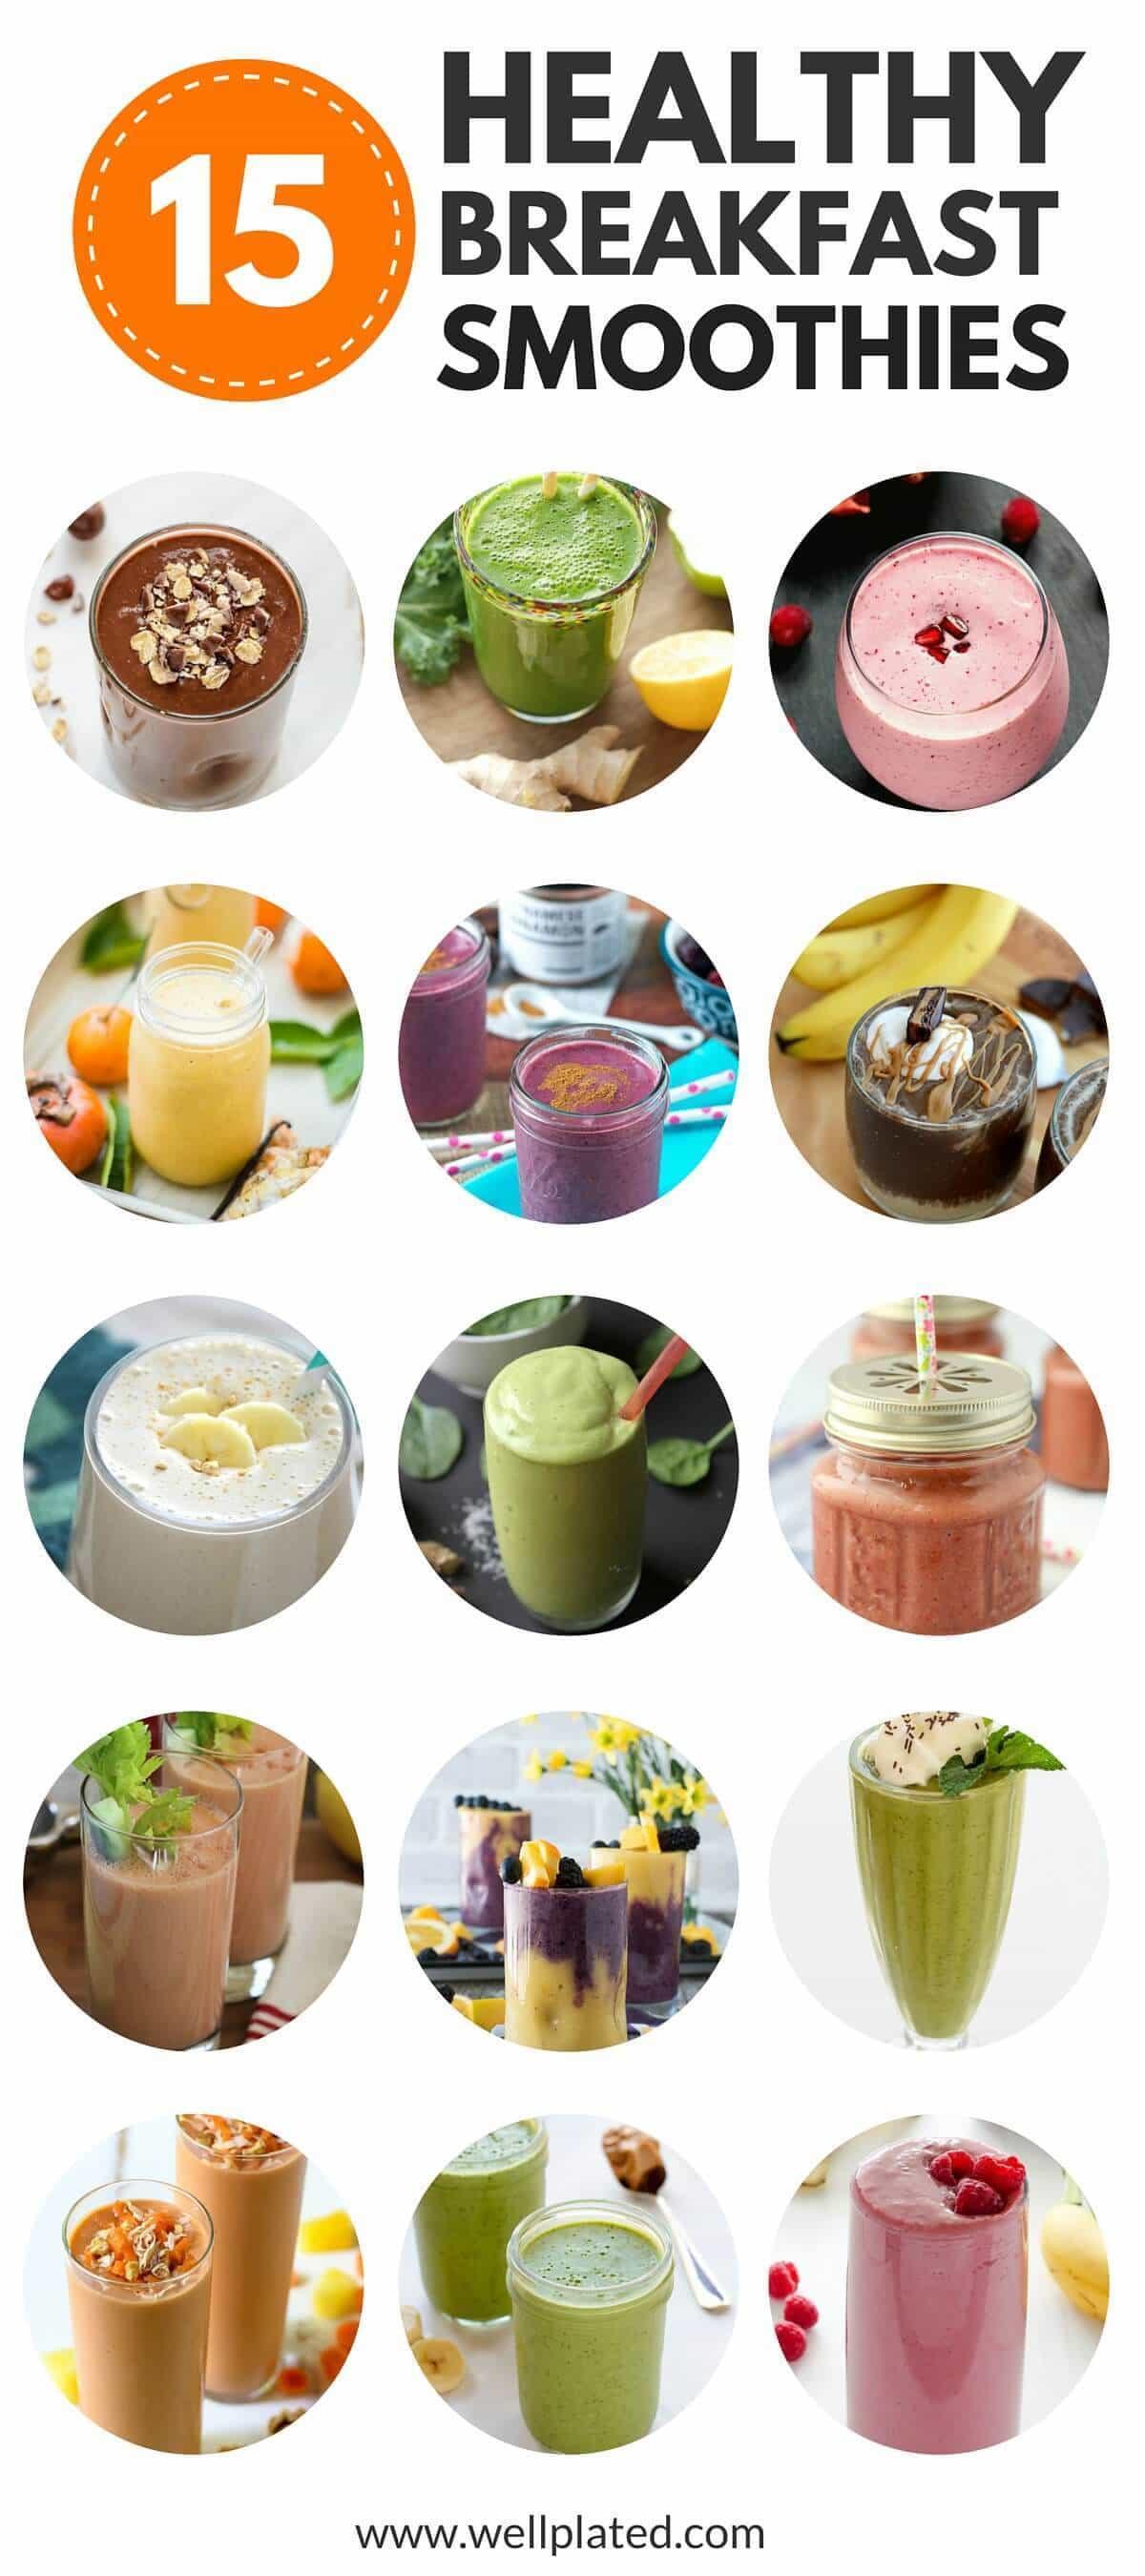 Best Healthy Breakfast Smoothies  The Best 15 Healthy Breakfast Smoothies